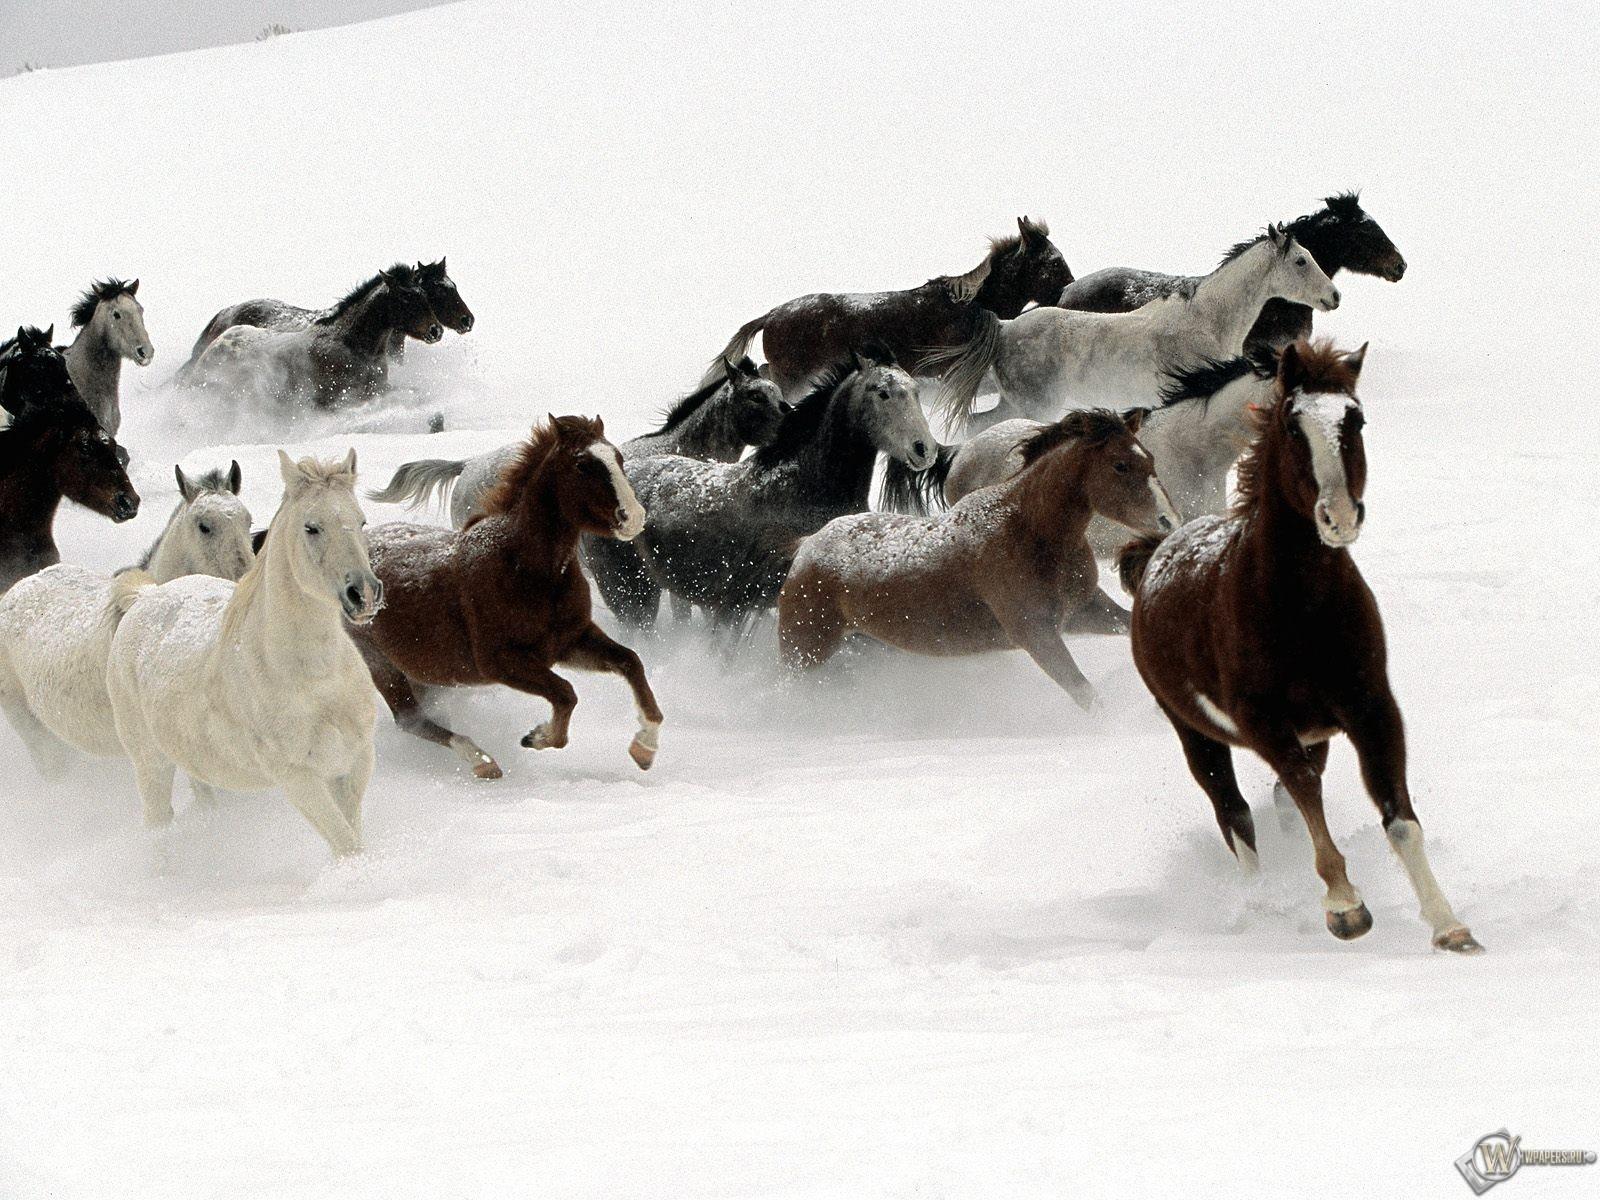 Кони бегущие по снегу 1600x1200